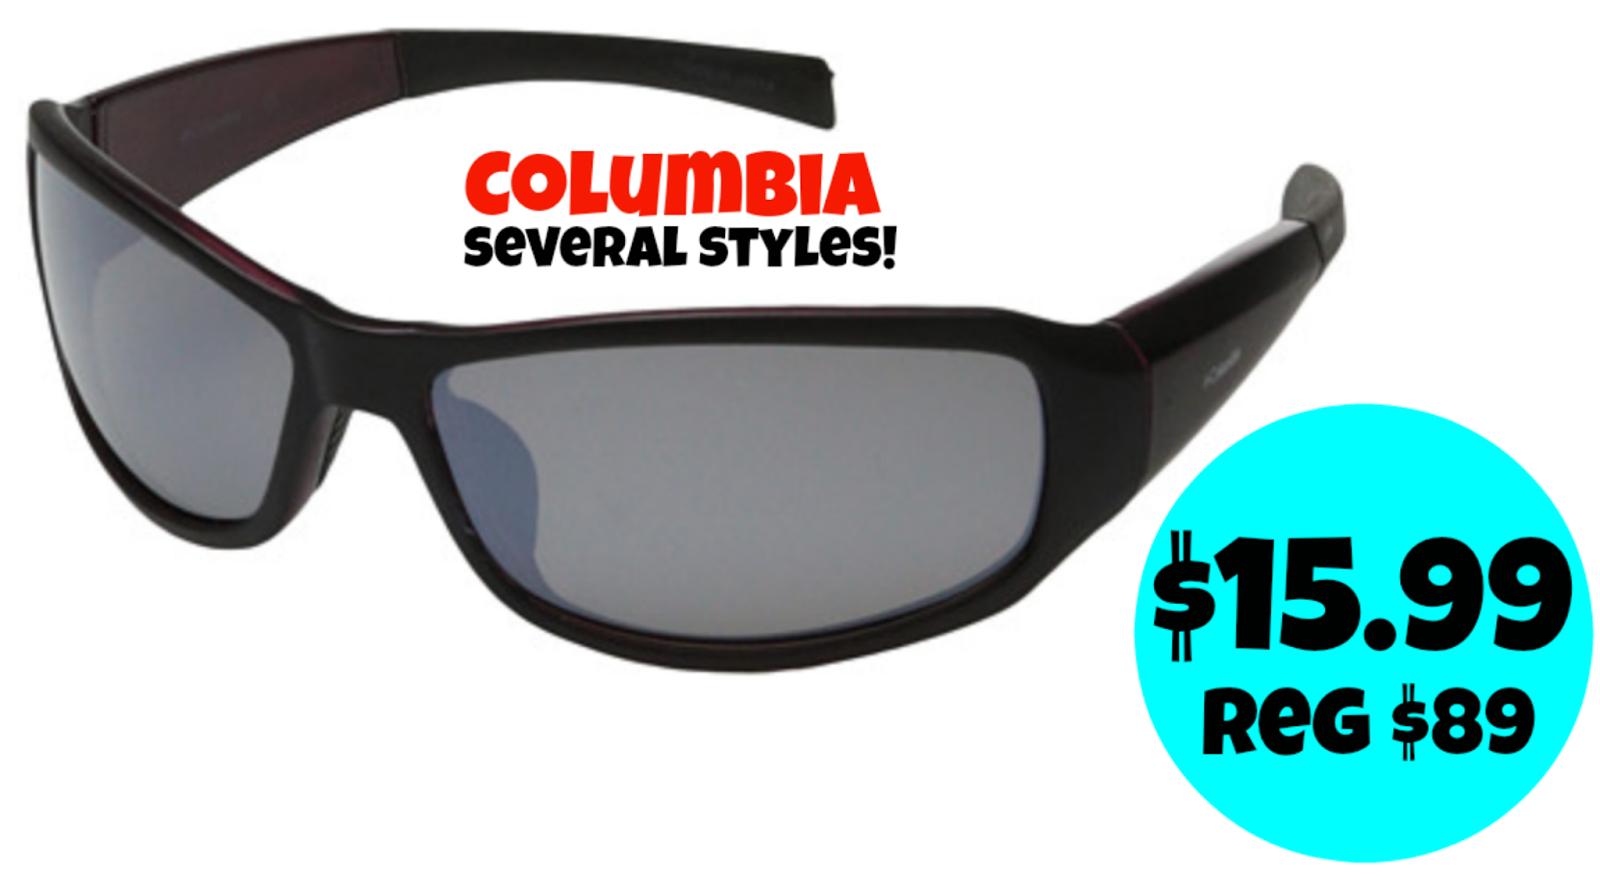 http://www.thebinderladies.com/2015/02/6pm-com-columbia-sunglasses-1599-free.html